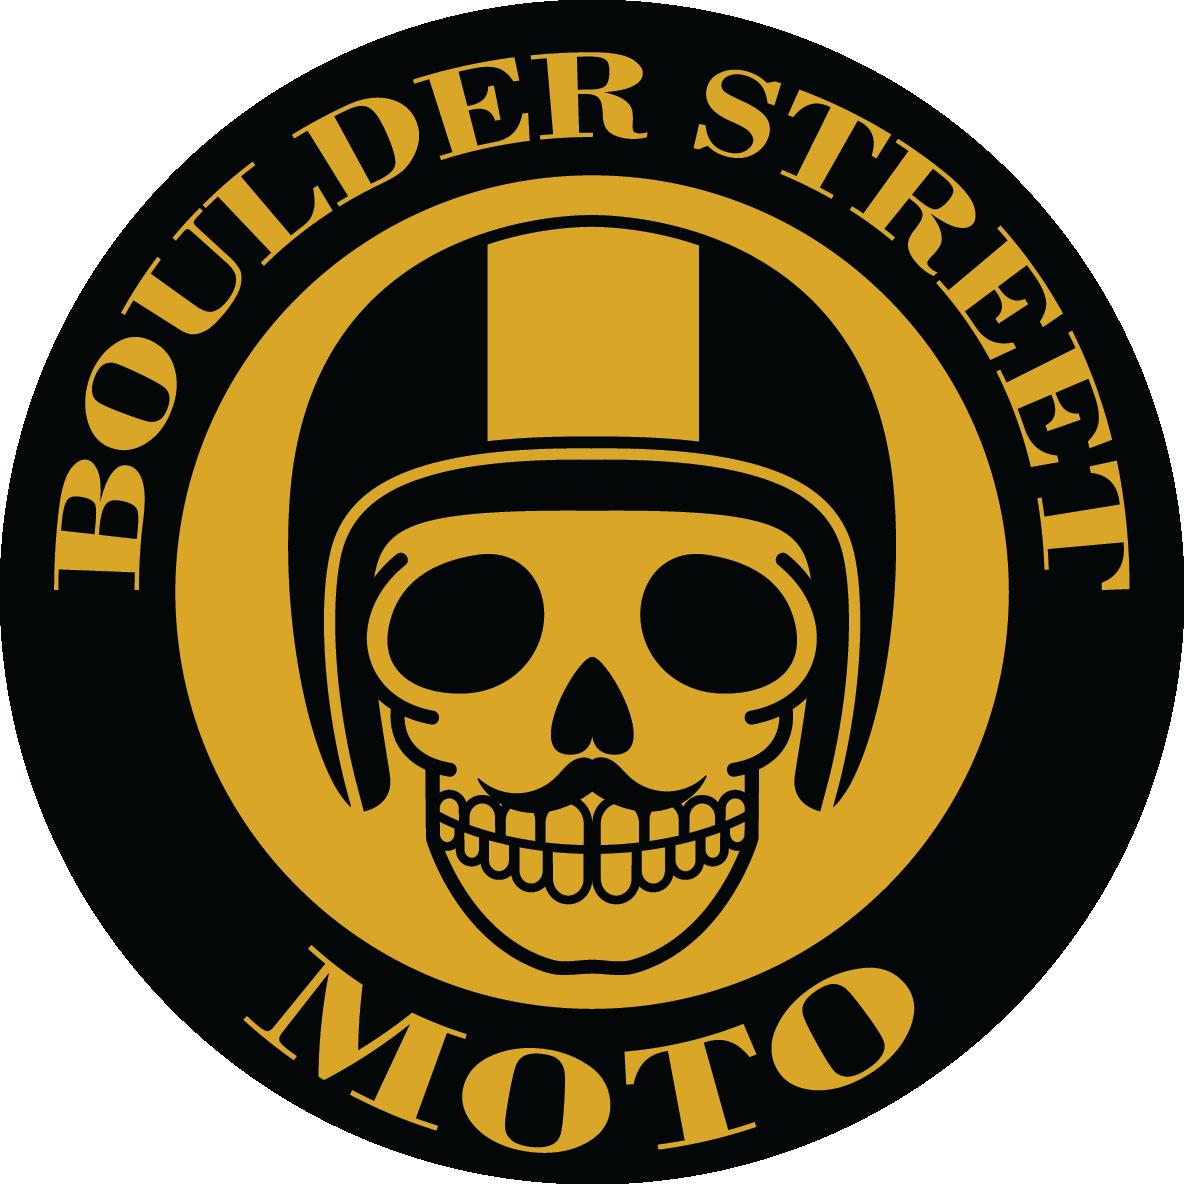 Boulder Street Moto